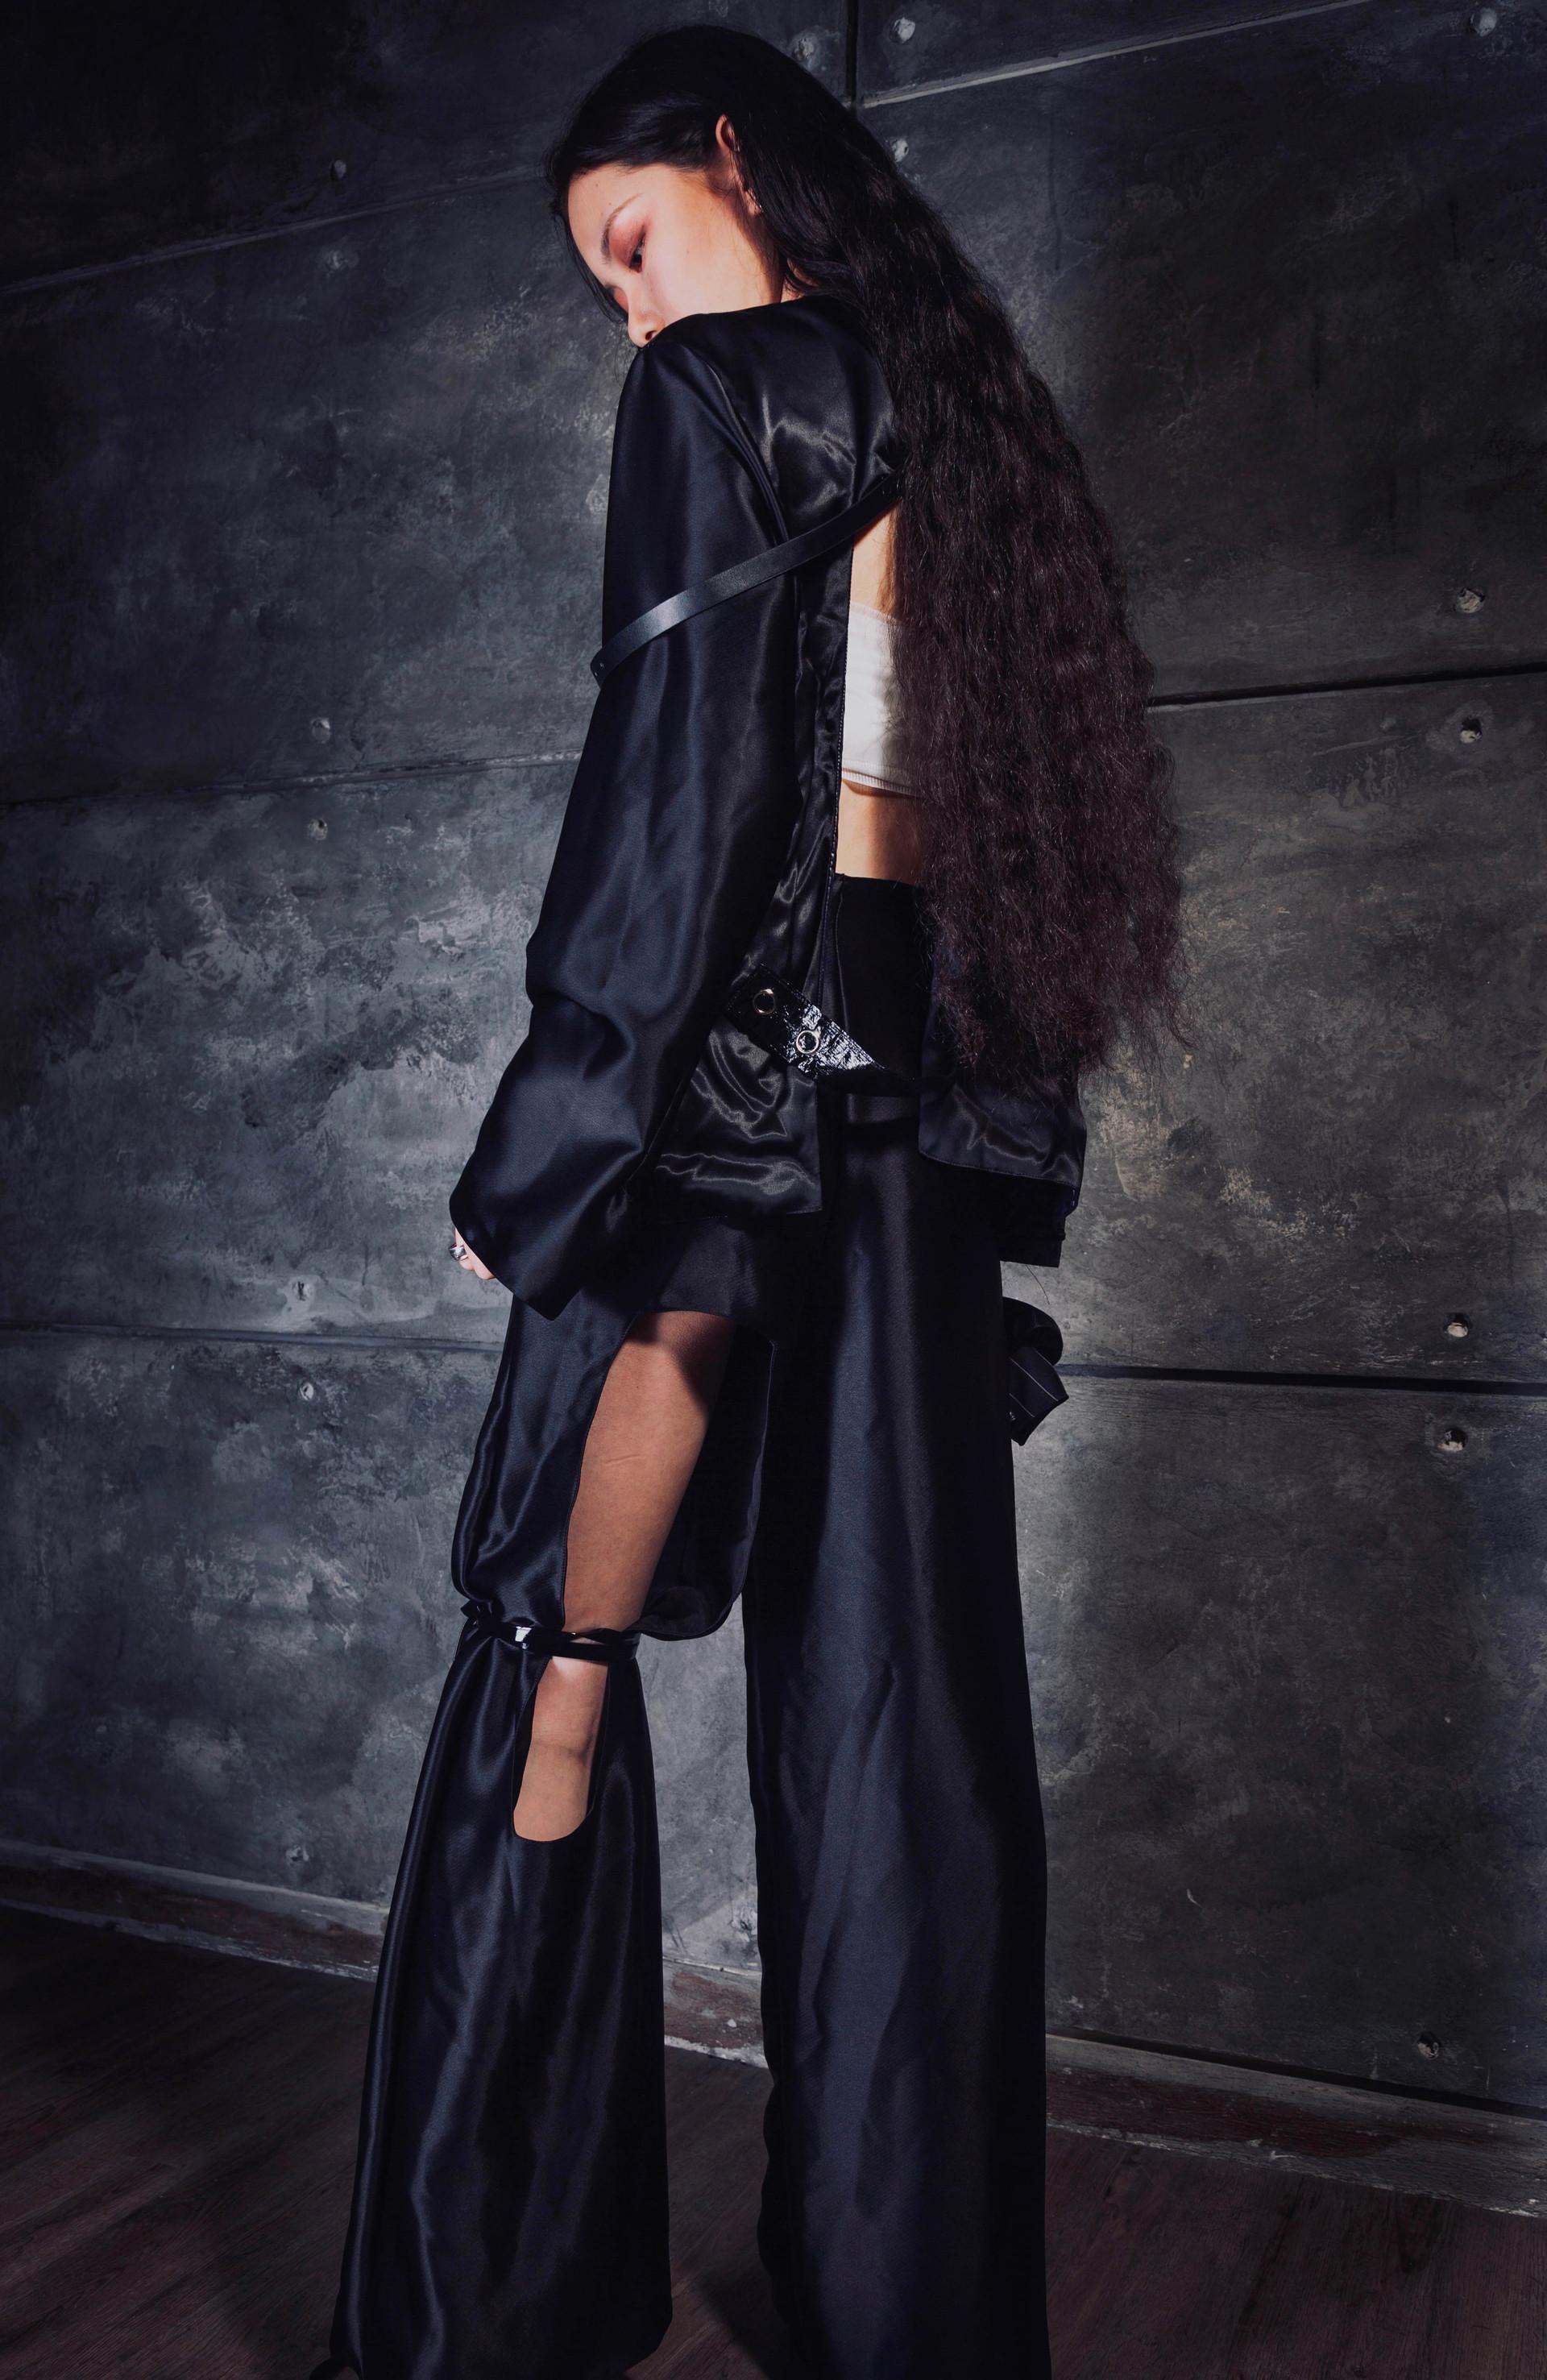 Design: Nadine Shu Styling: Nadine Shu Photograph: Alanis Santiago-Rodriguez Model: Vivian Li